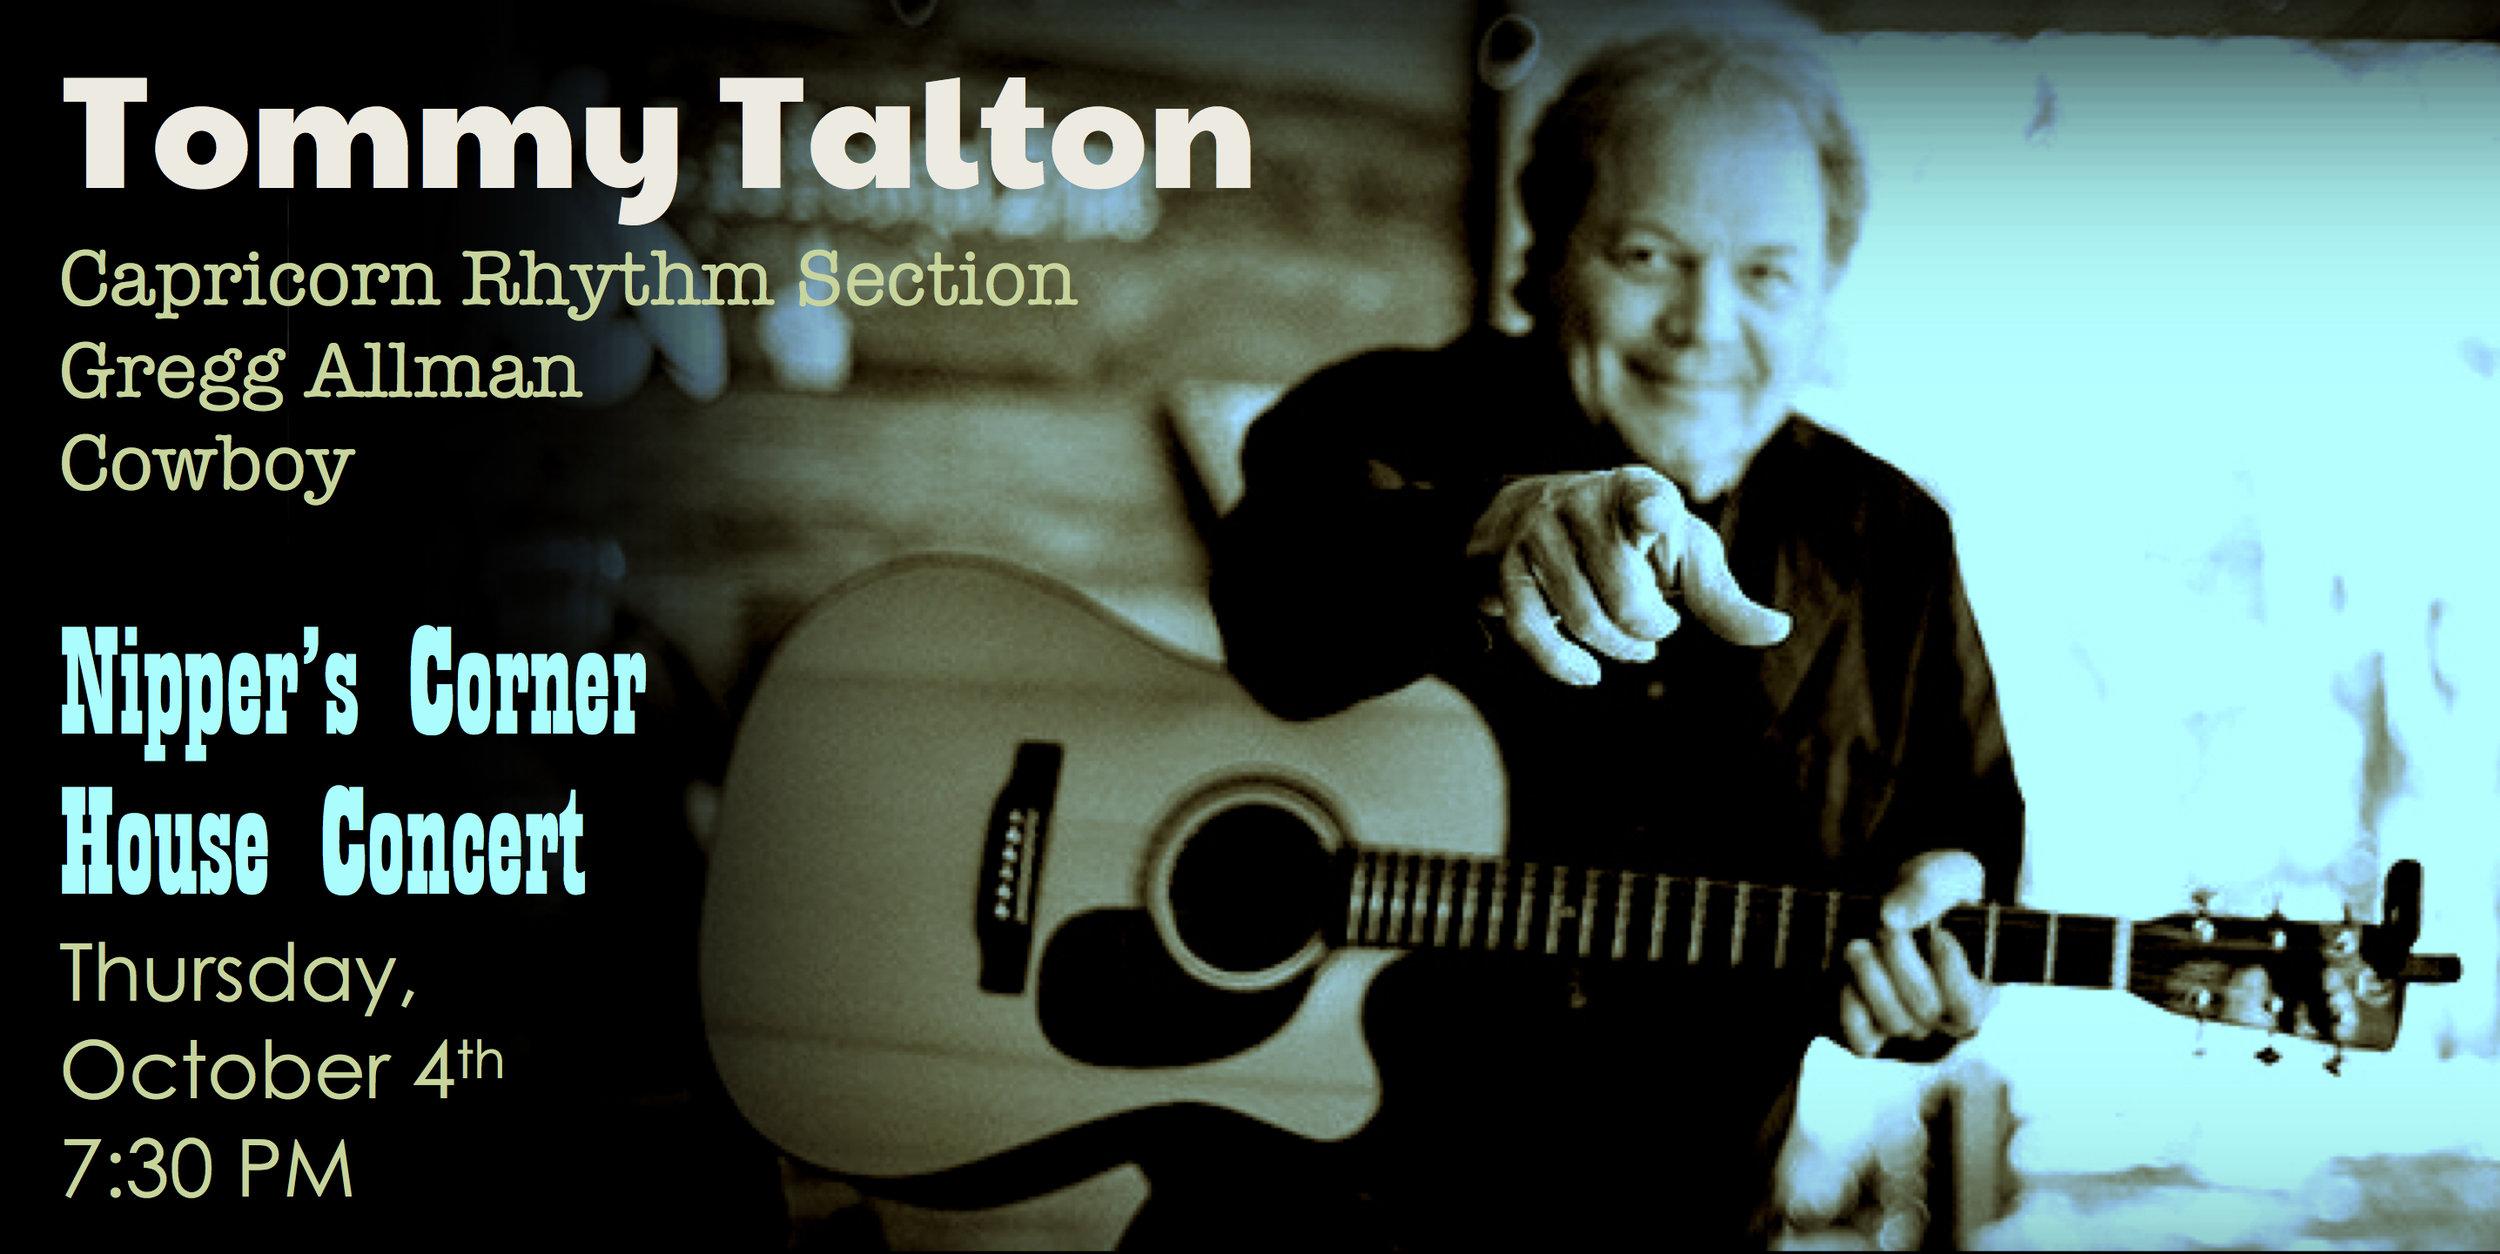 Tommy Talton Flyer.jpg